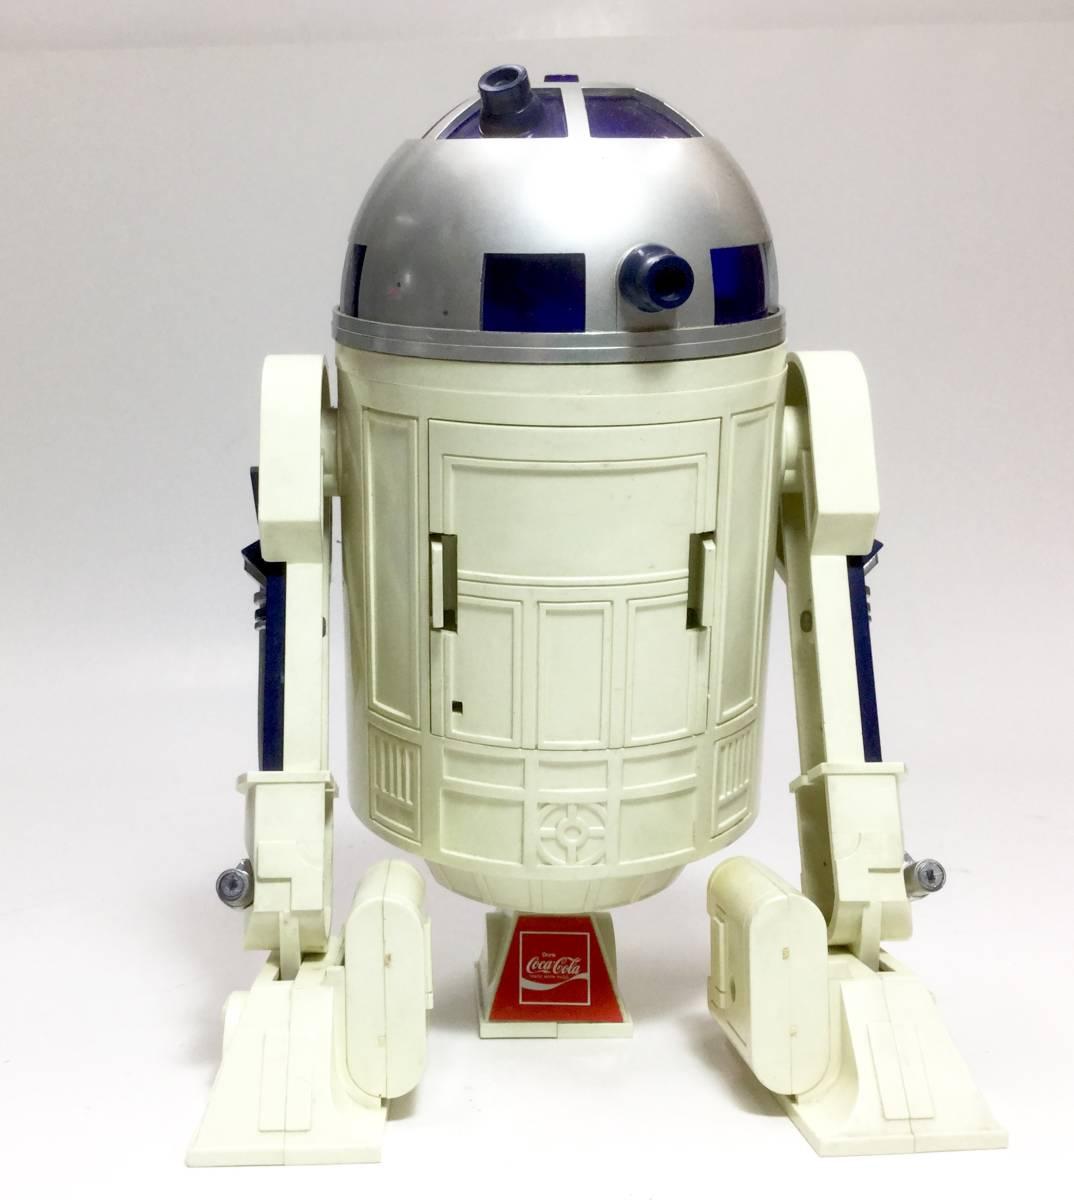 R2-D2 ラジオ 作動品 スターウォーズ 1977年版 コカコーラ 懸賞品 非売品 レトロ ビンテージ _画像7